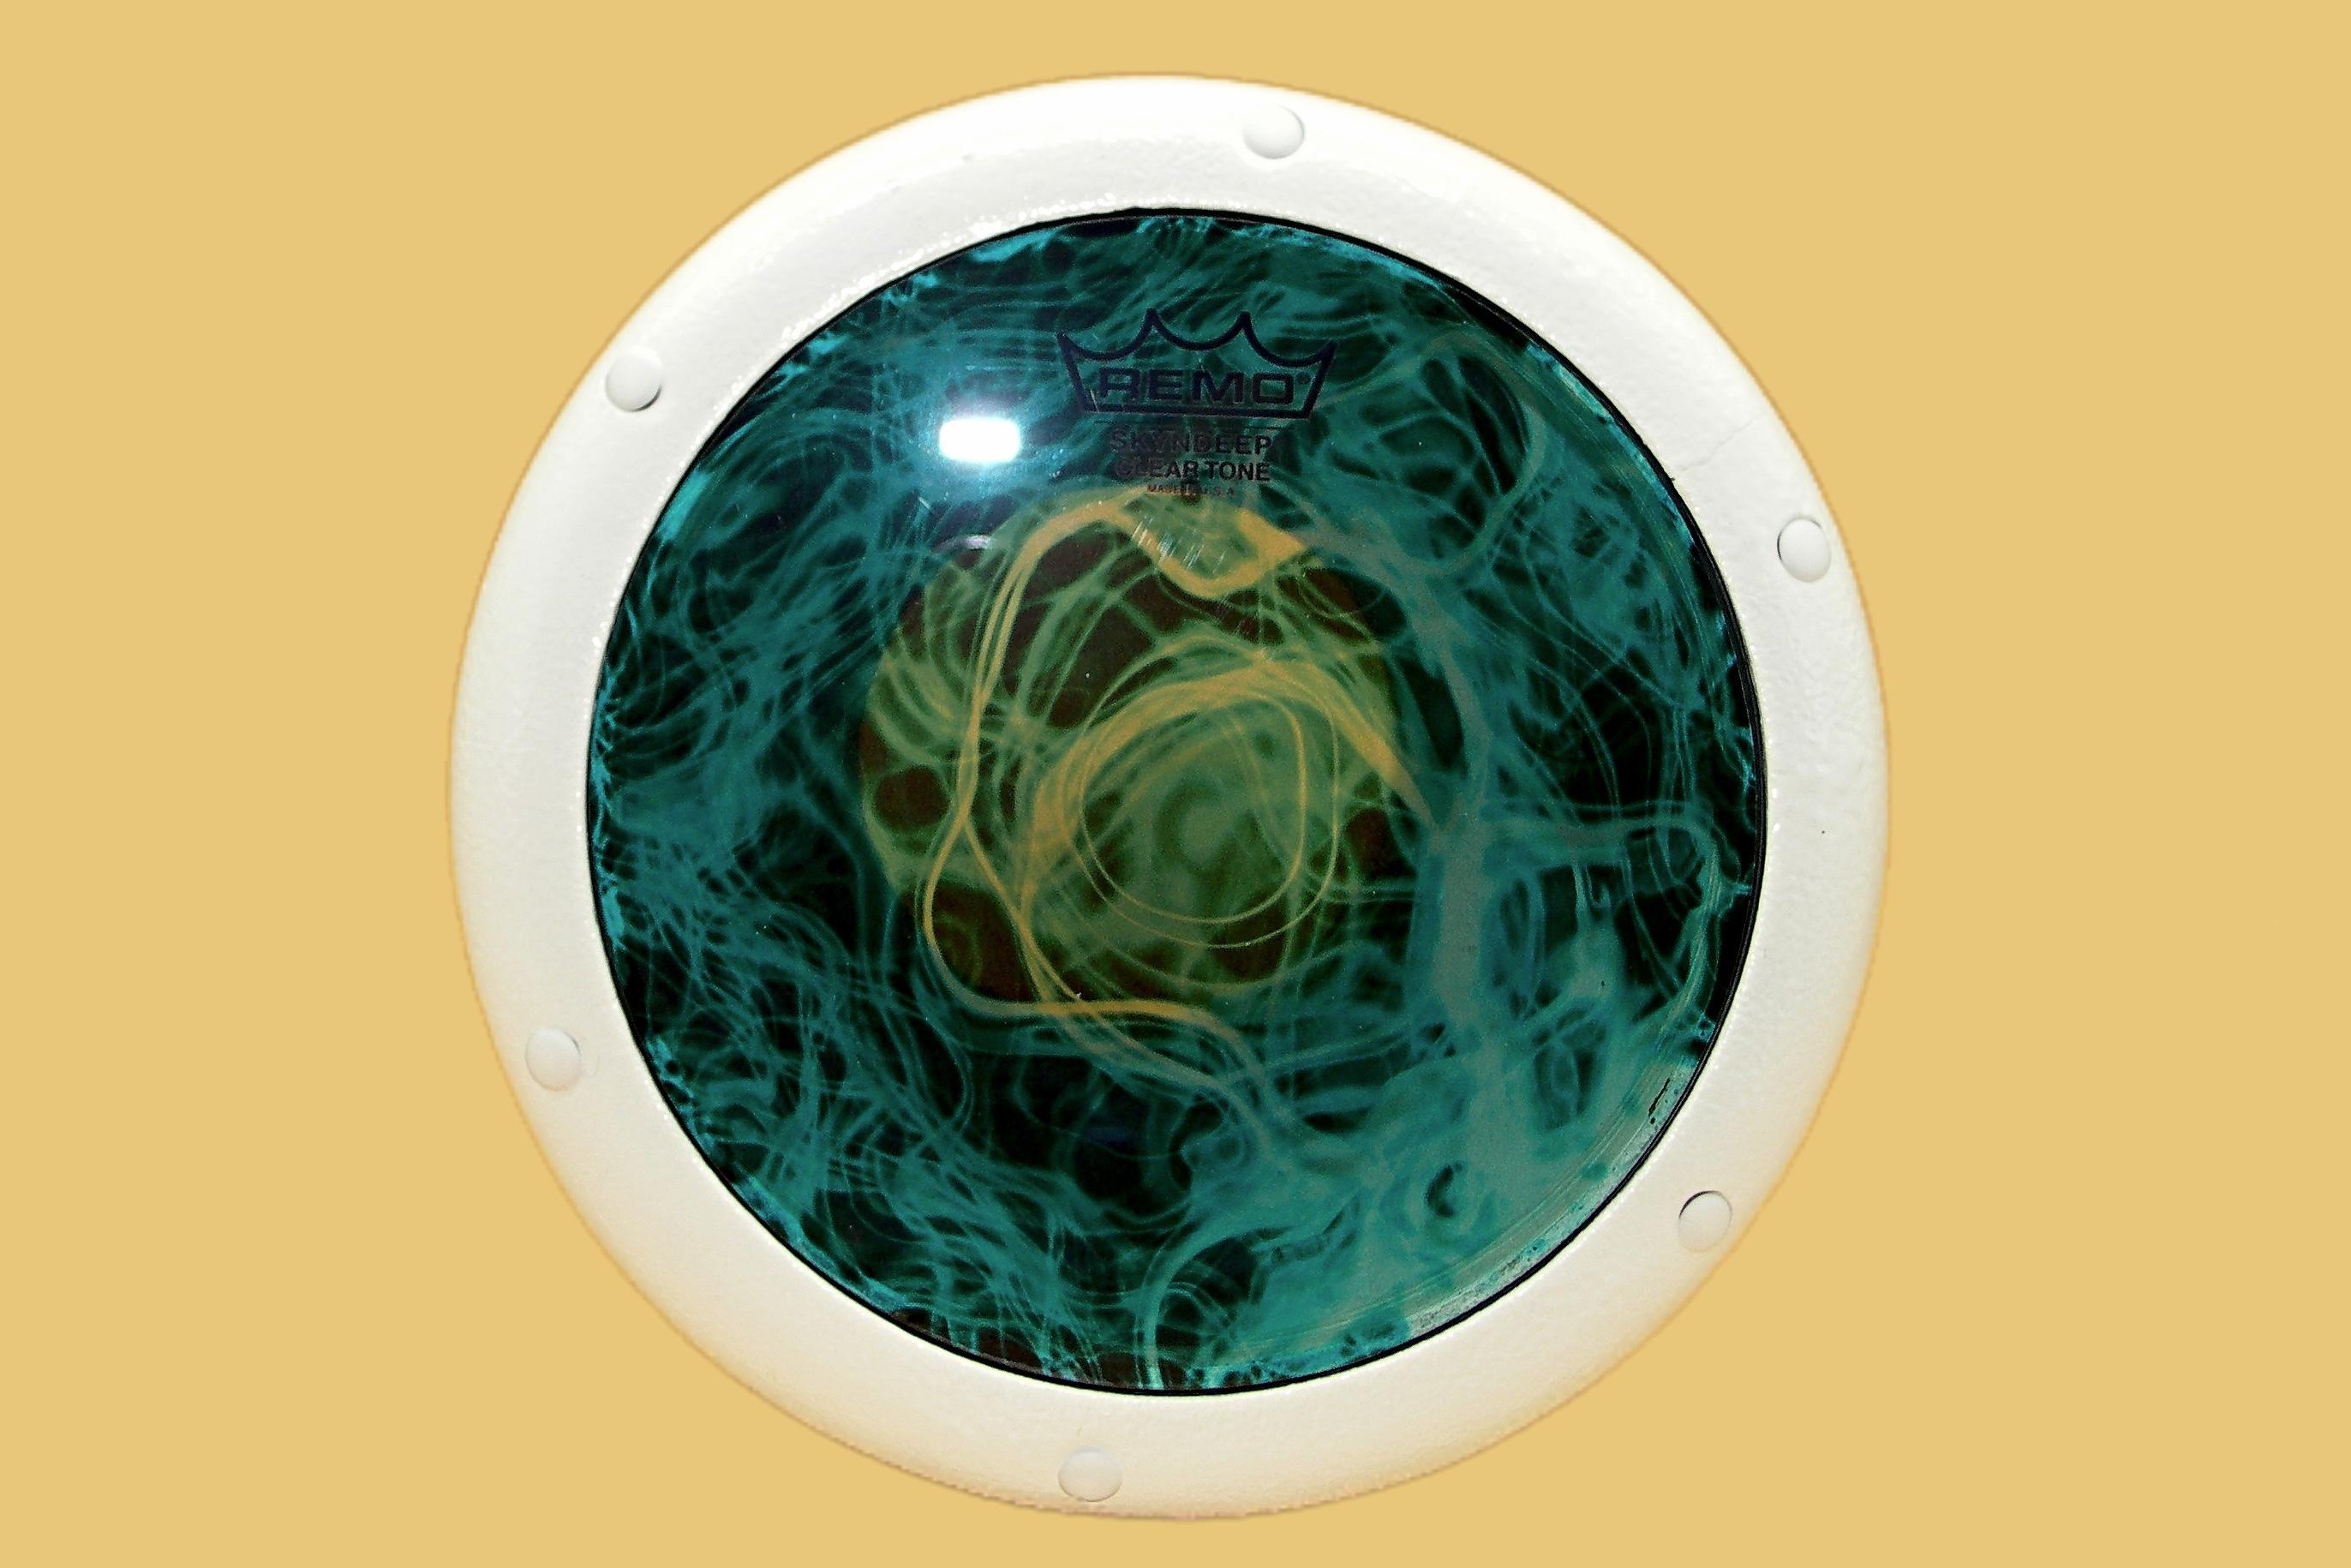 Egyptian-Unknown-White-Turquoise-Mist-Cleartone-Head-Darabuka